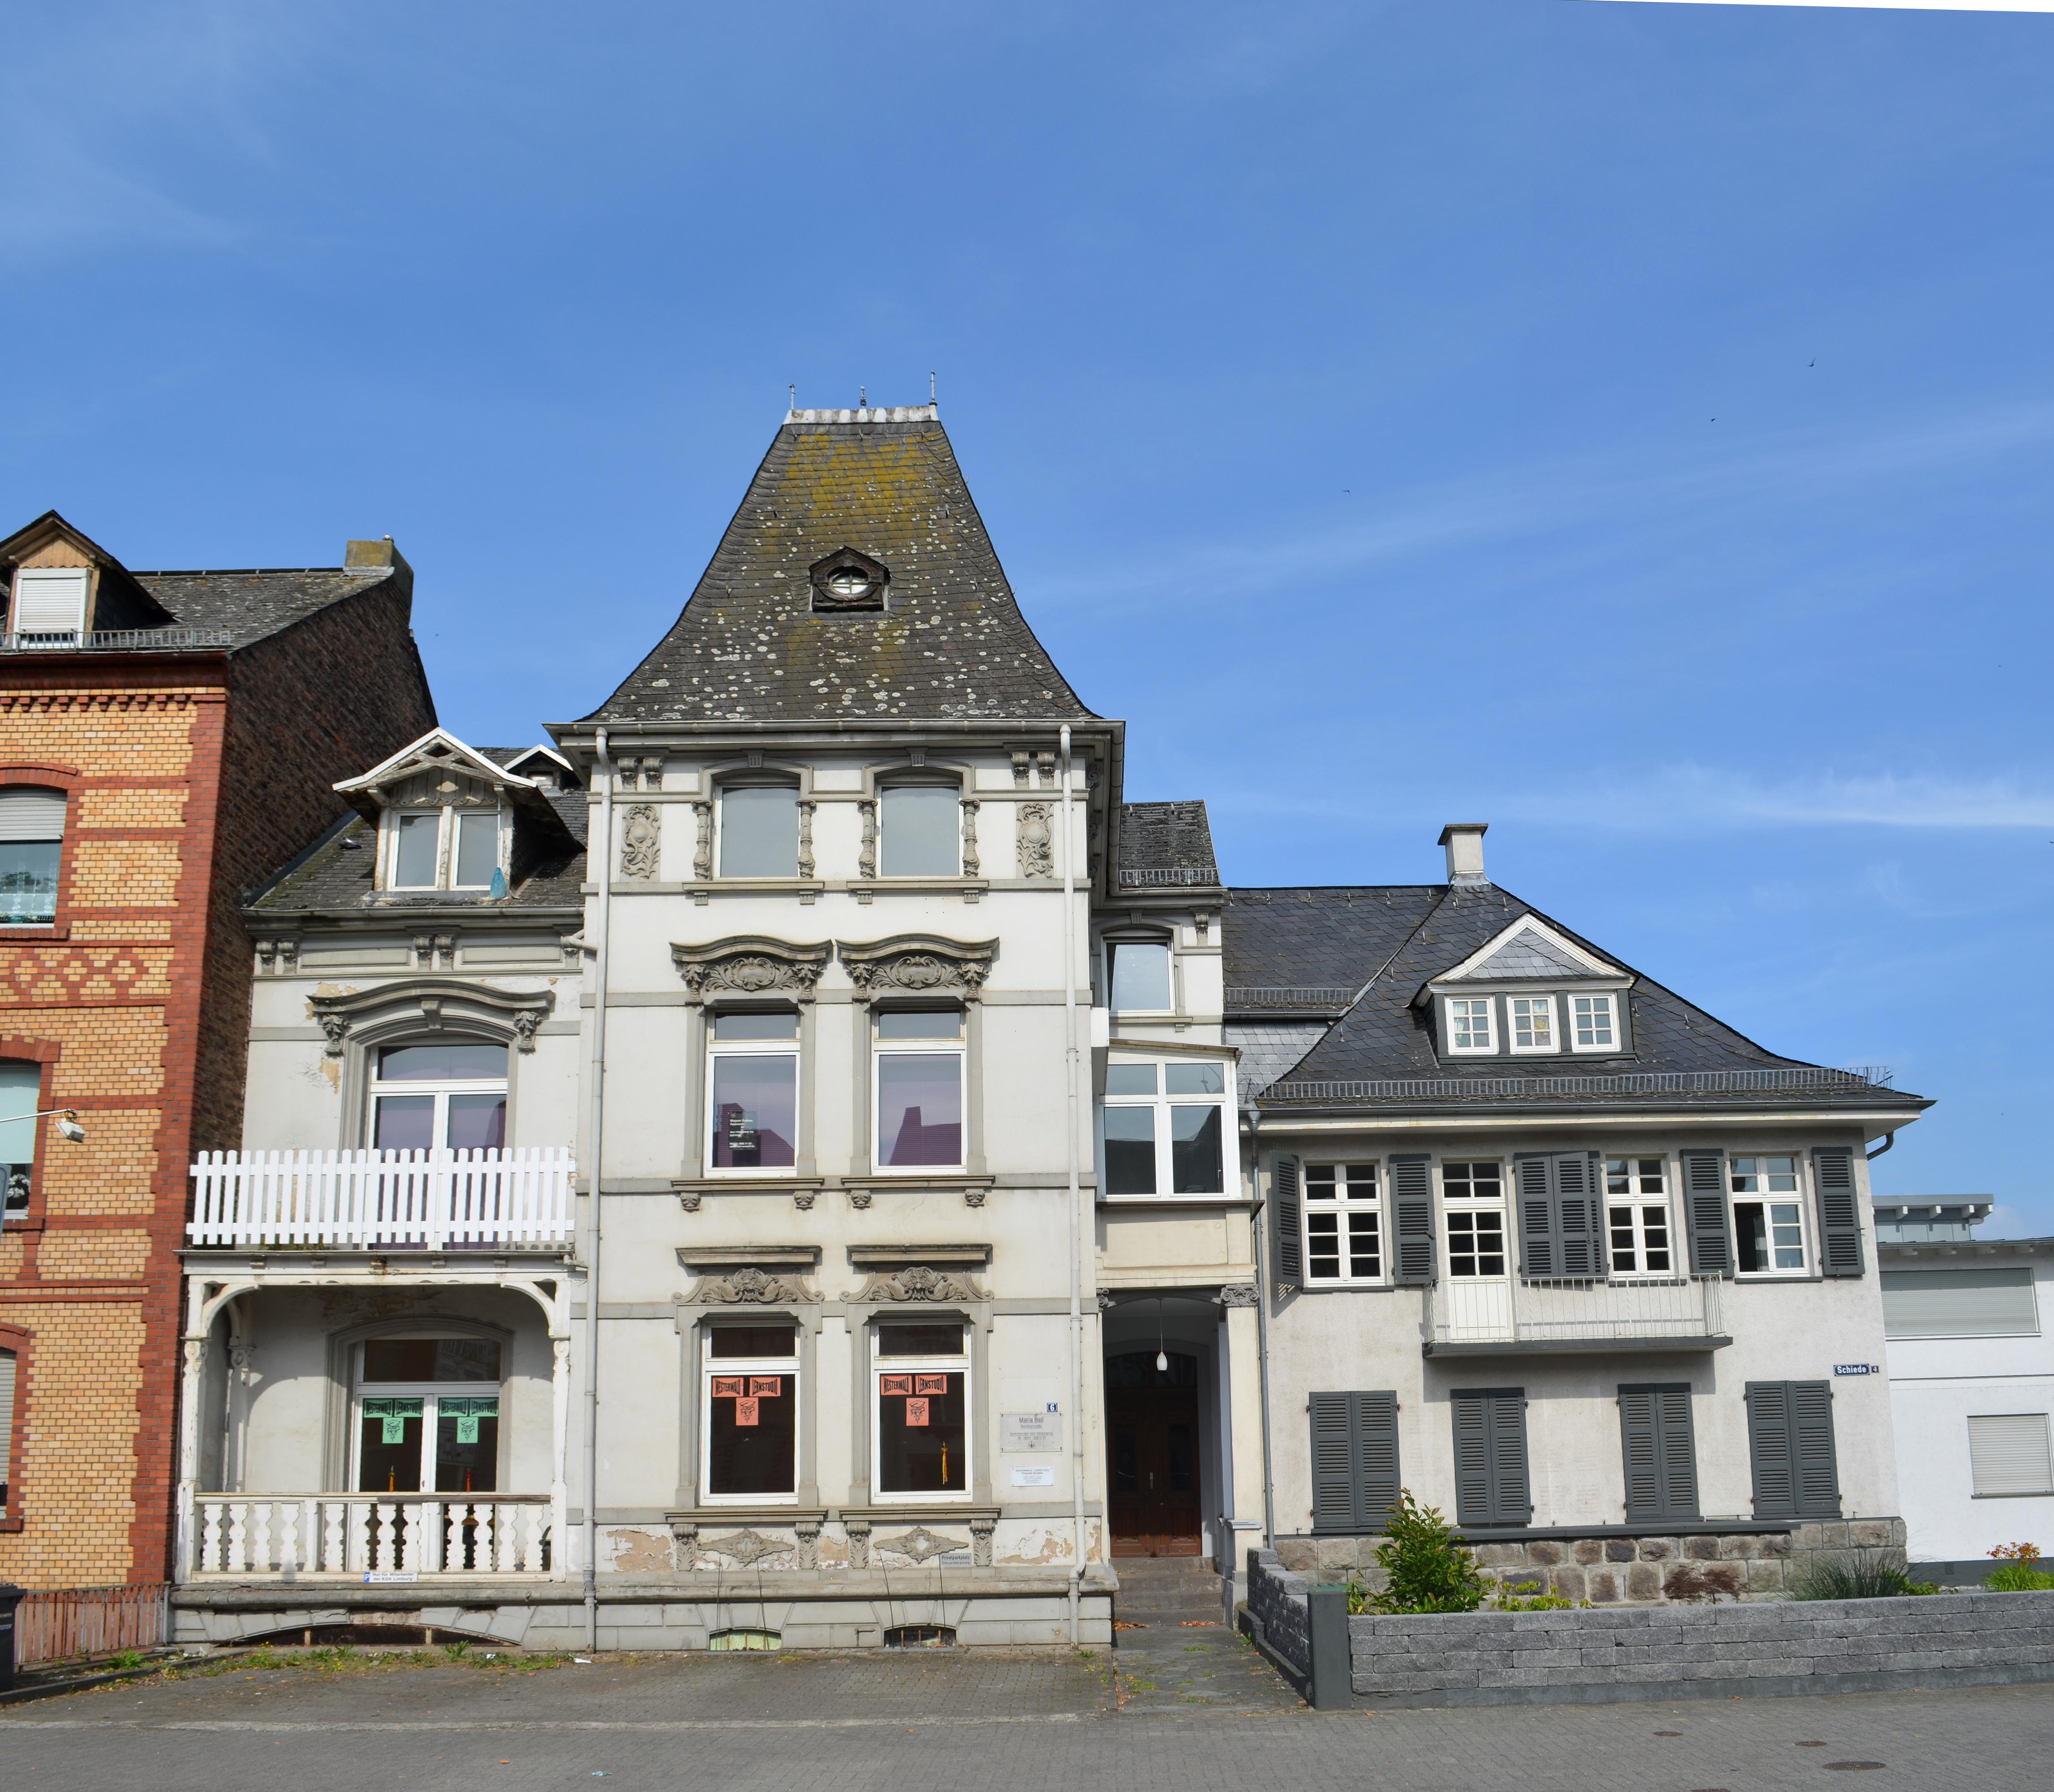 File:Limburg, Schiede 6.jpg